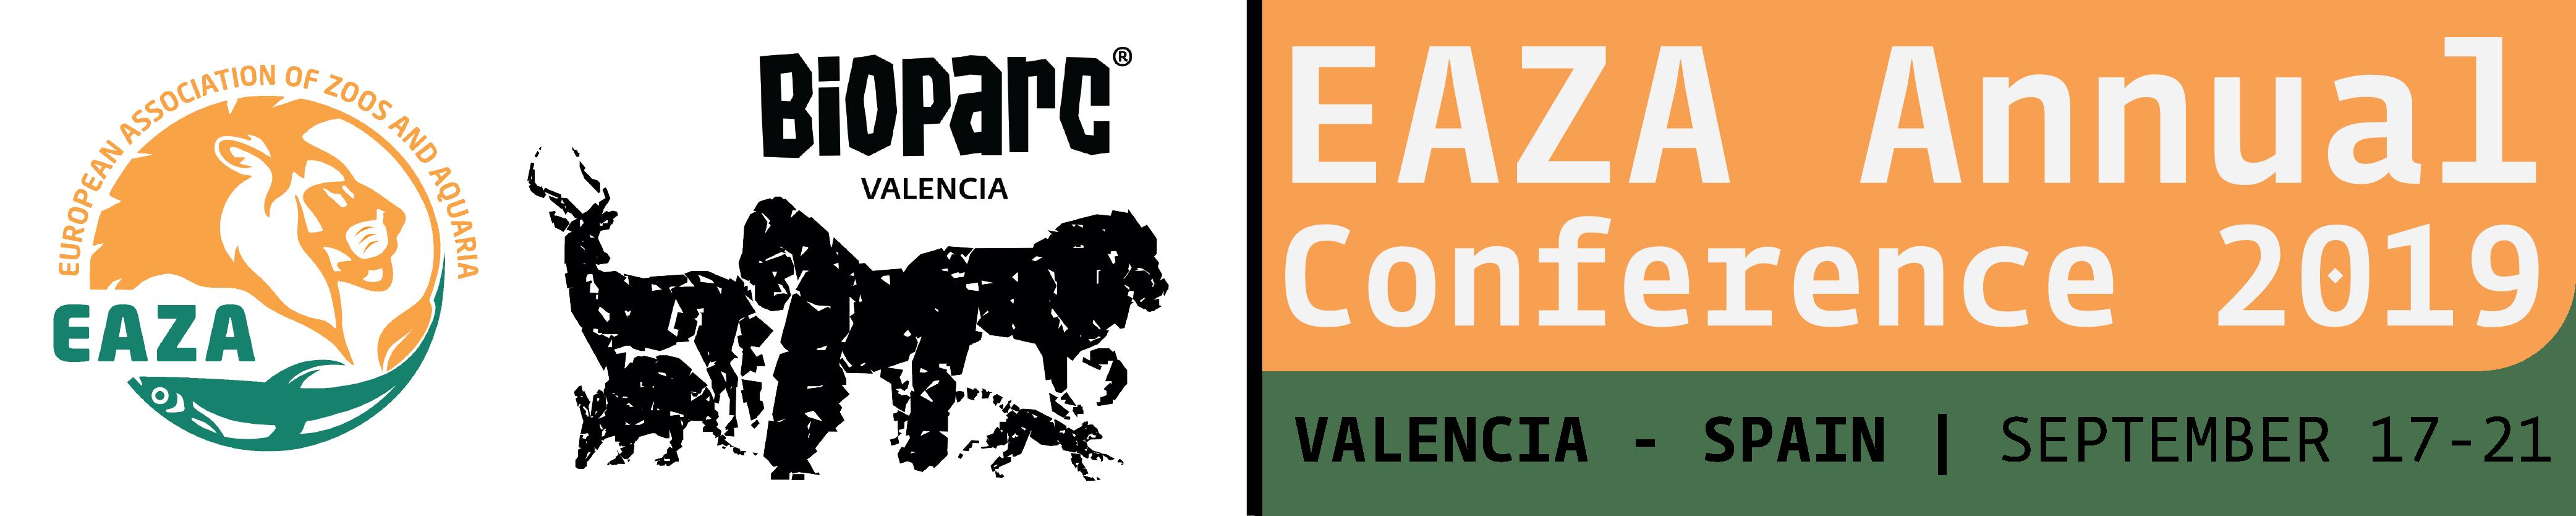 eaza2019